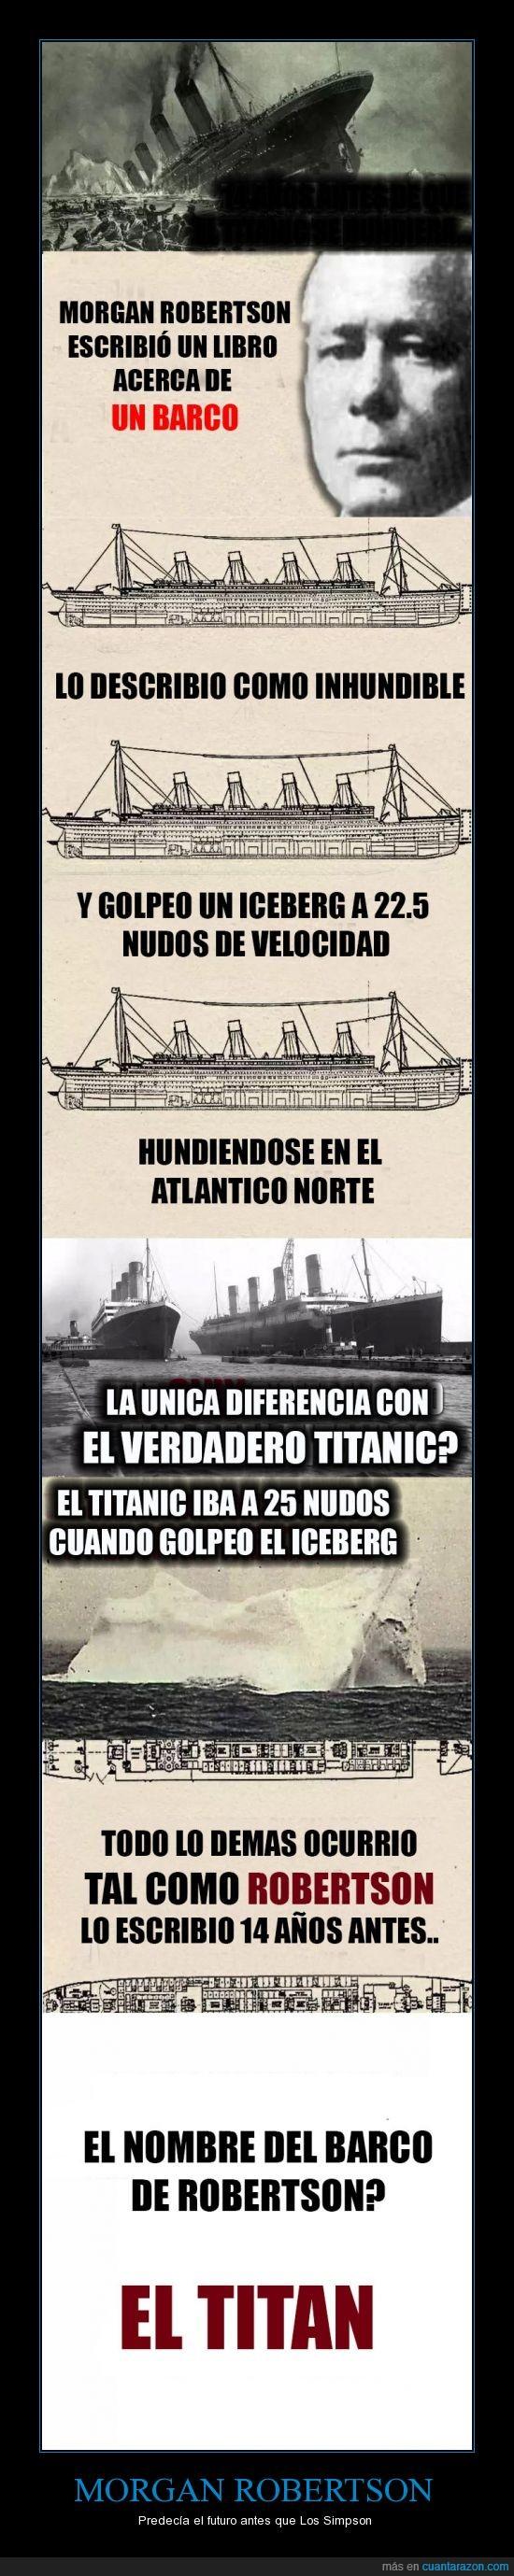 accidente,barco,futuro,hundir,igual,libro,mismo,premonicion,titan,titanic